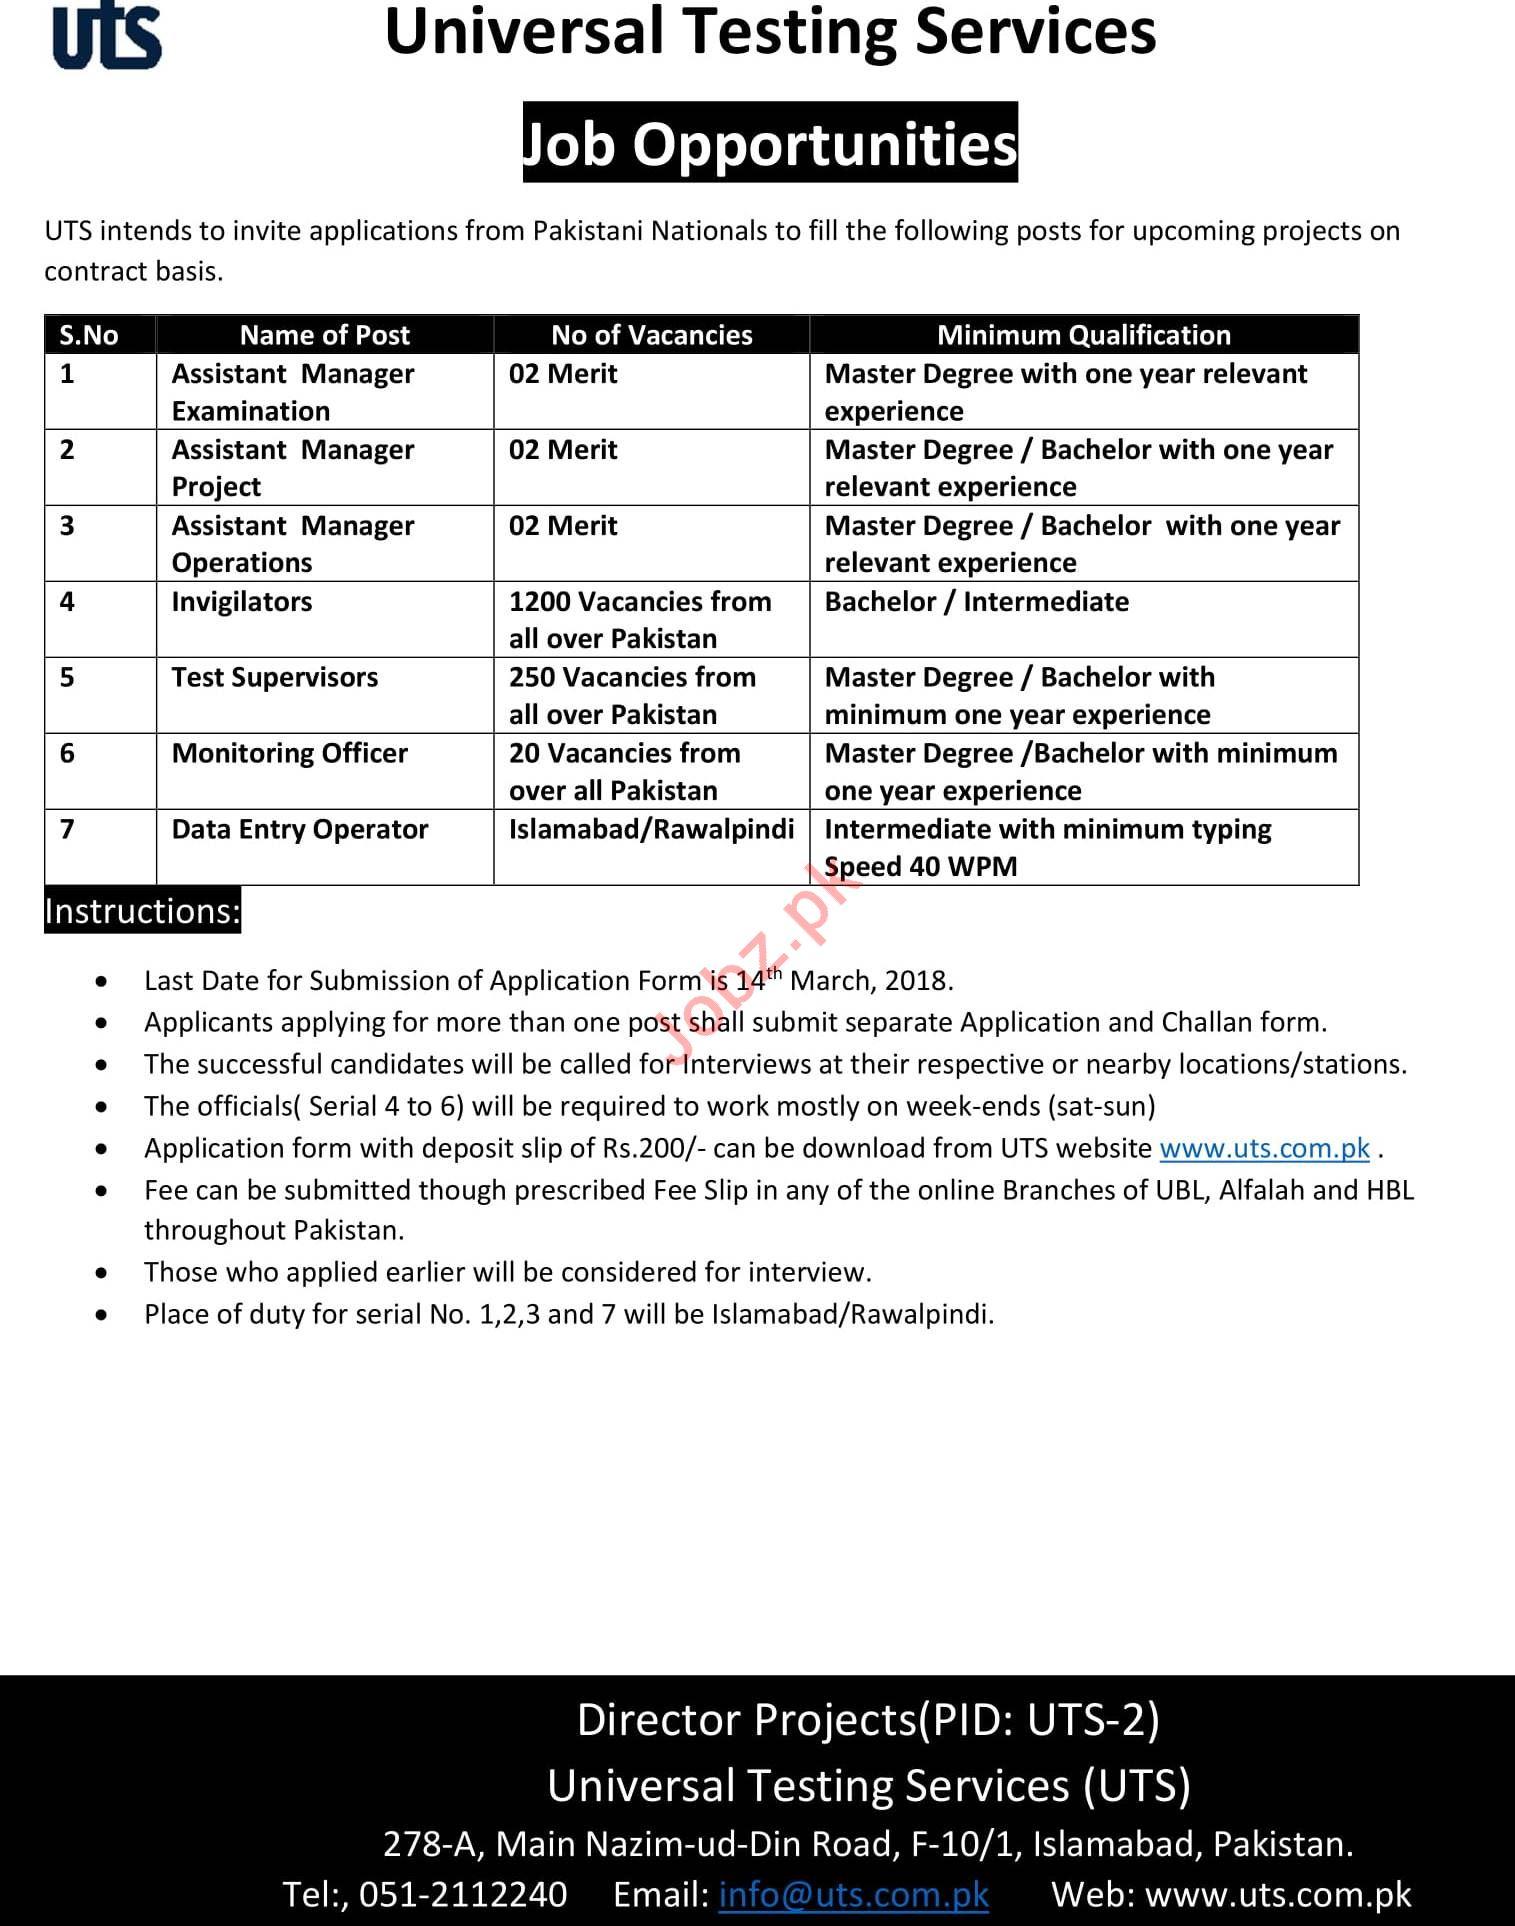 Universal Testing Services UTS Islamabad Jobs 2018 2019 Job